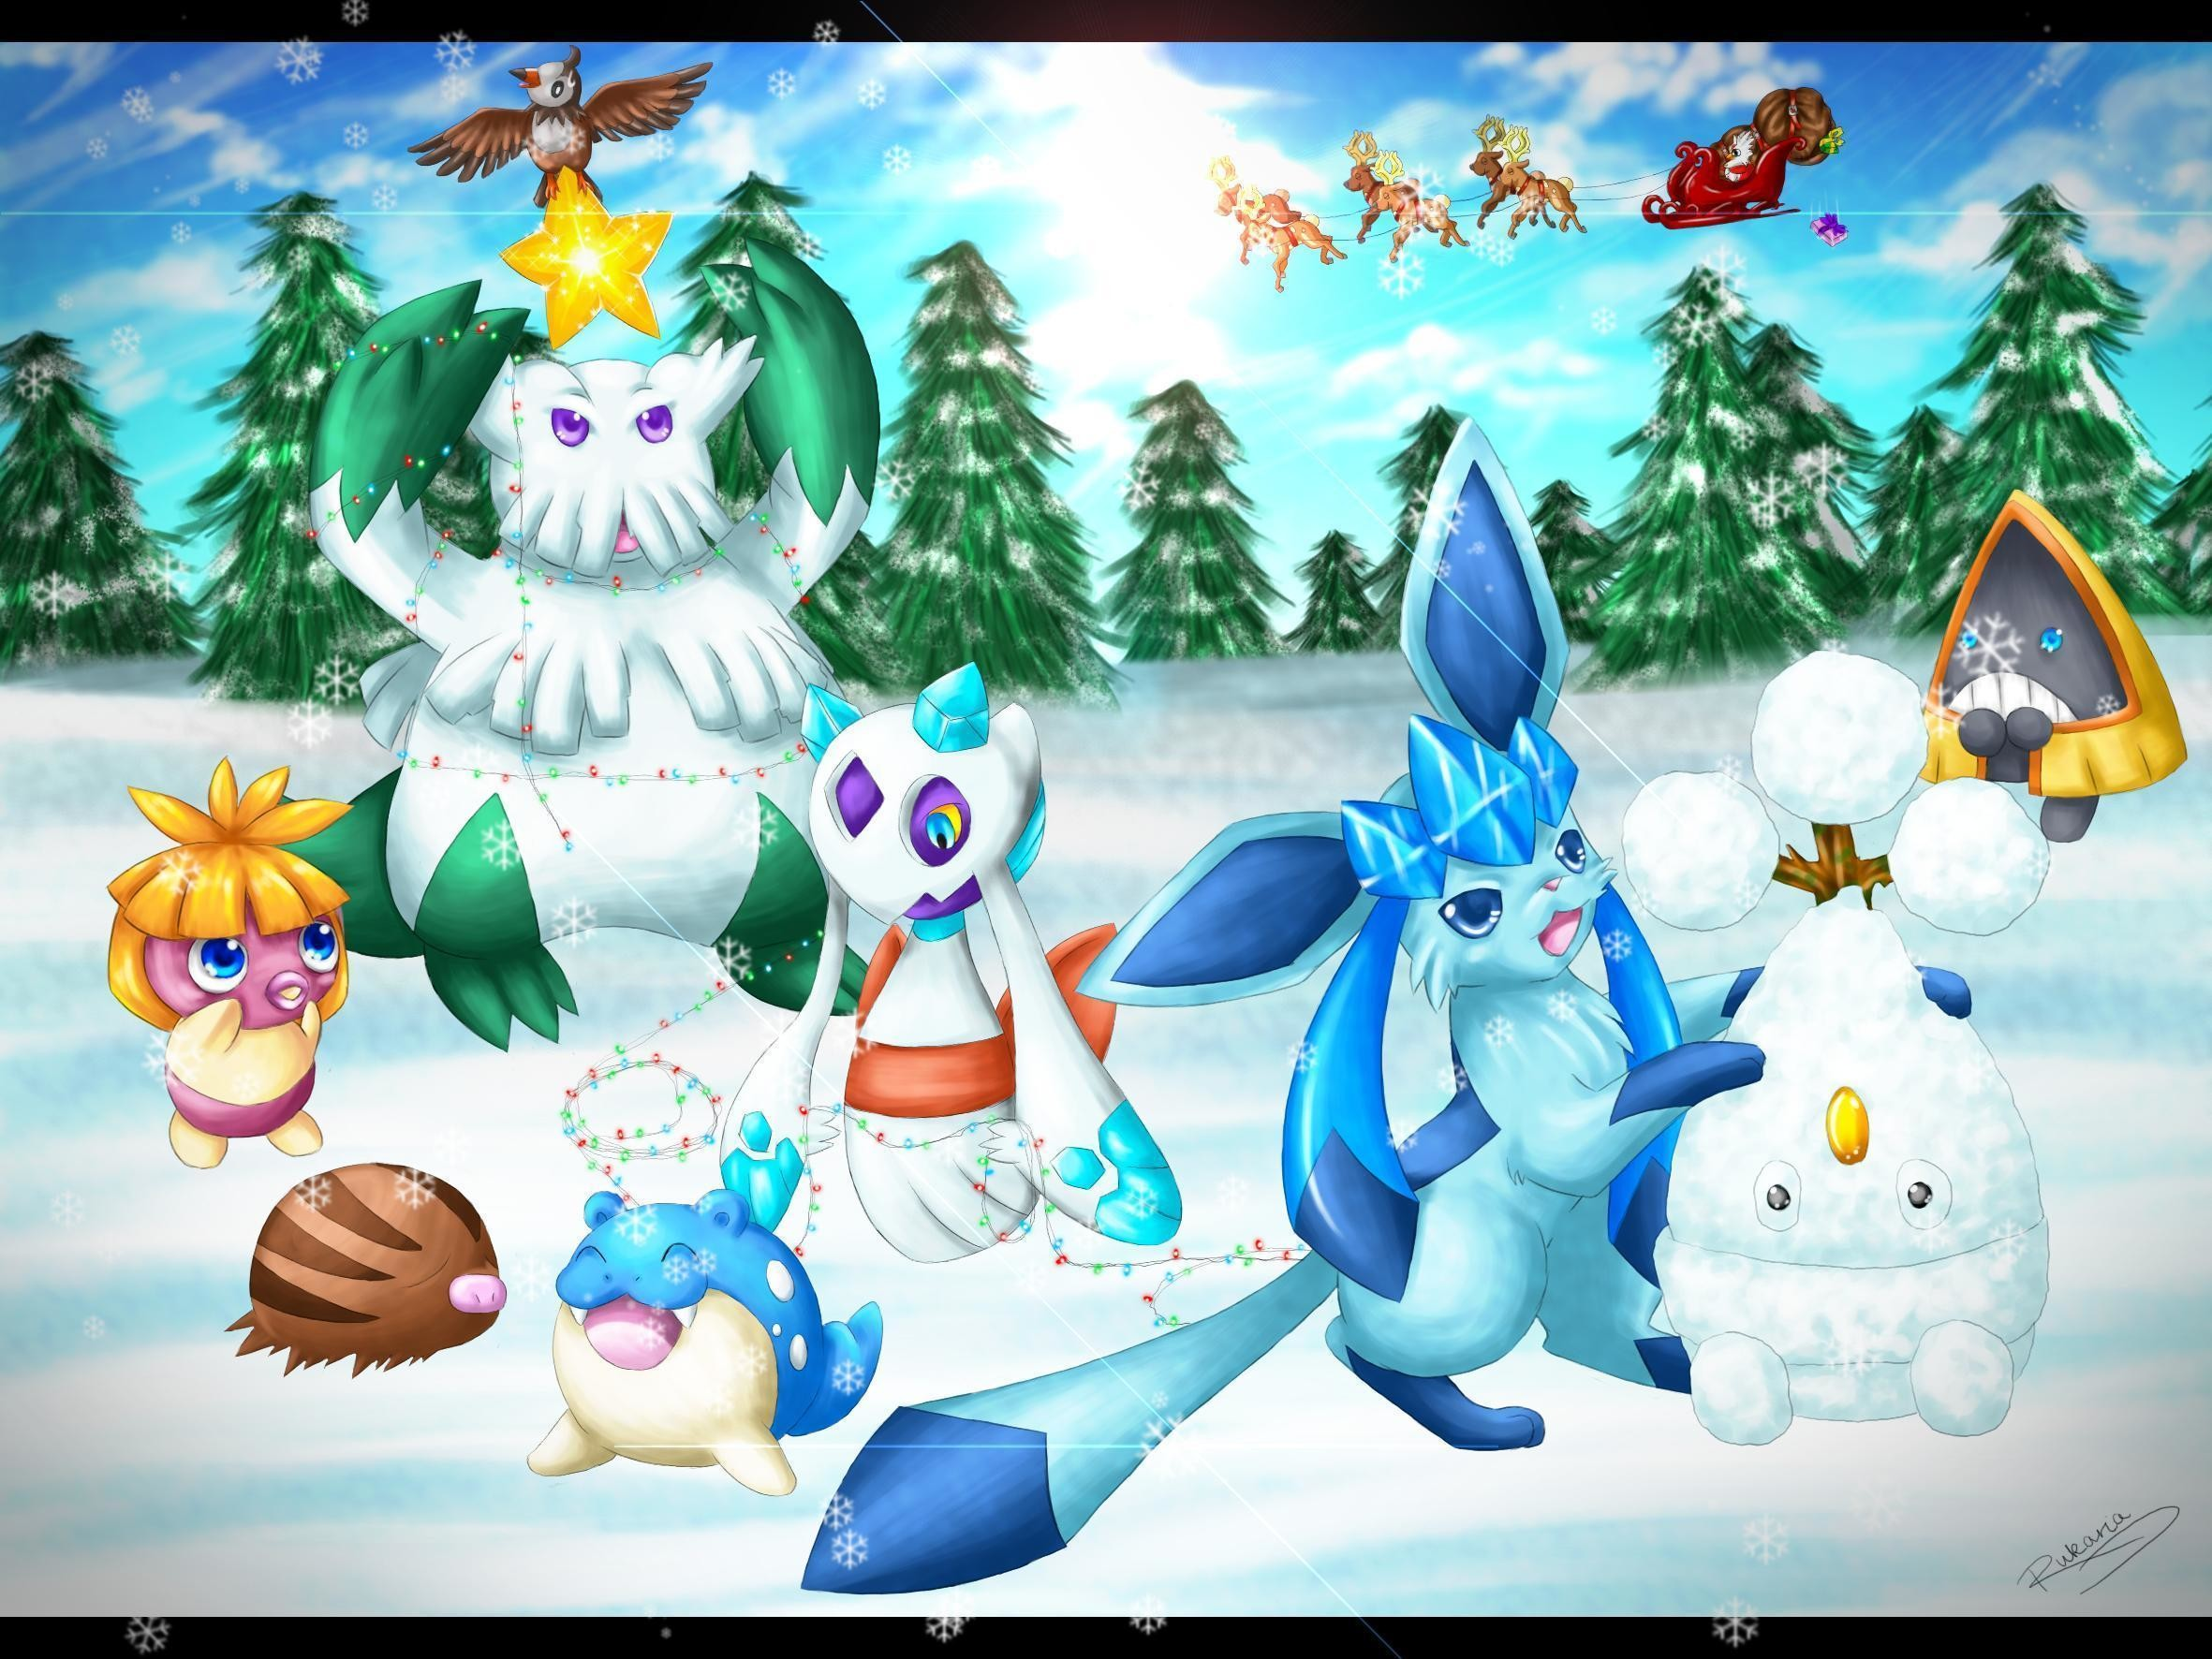 Filename: CUnpe3p.jpg · view image. Found on: pokemon-christmas-wallpaper